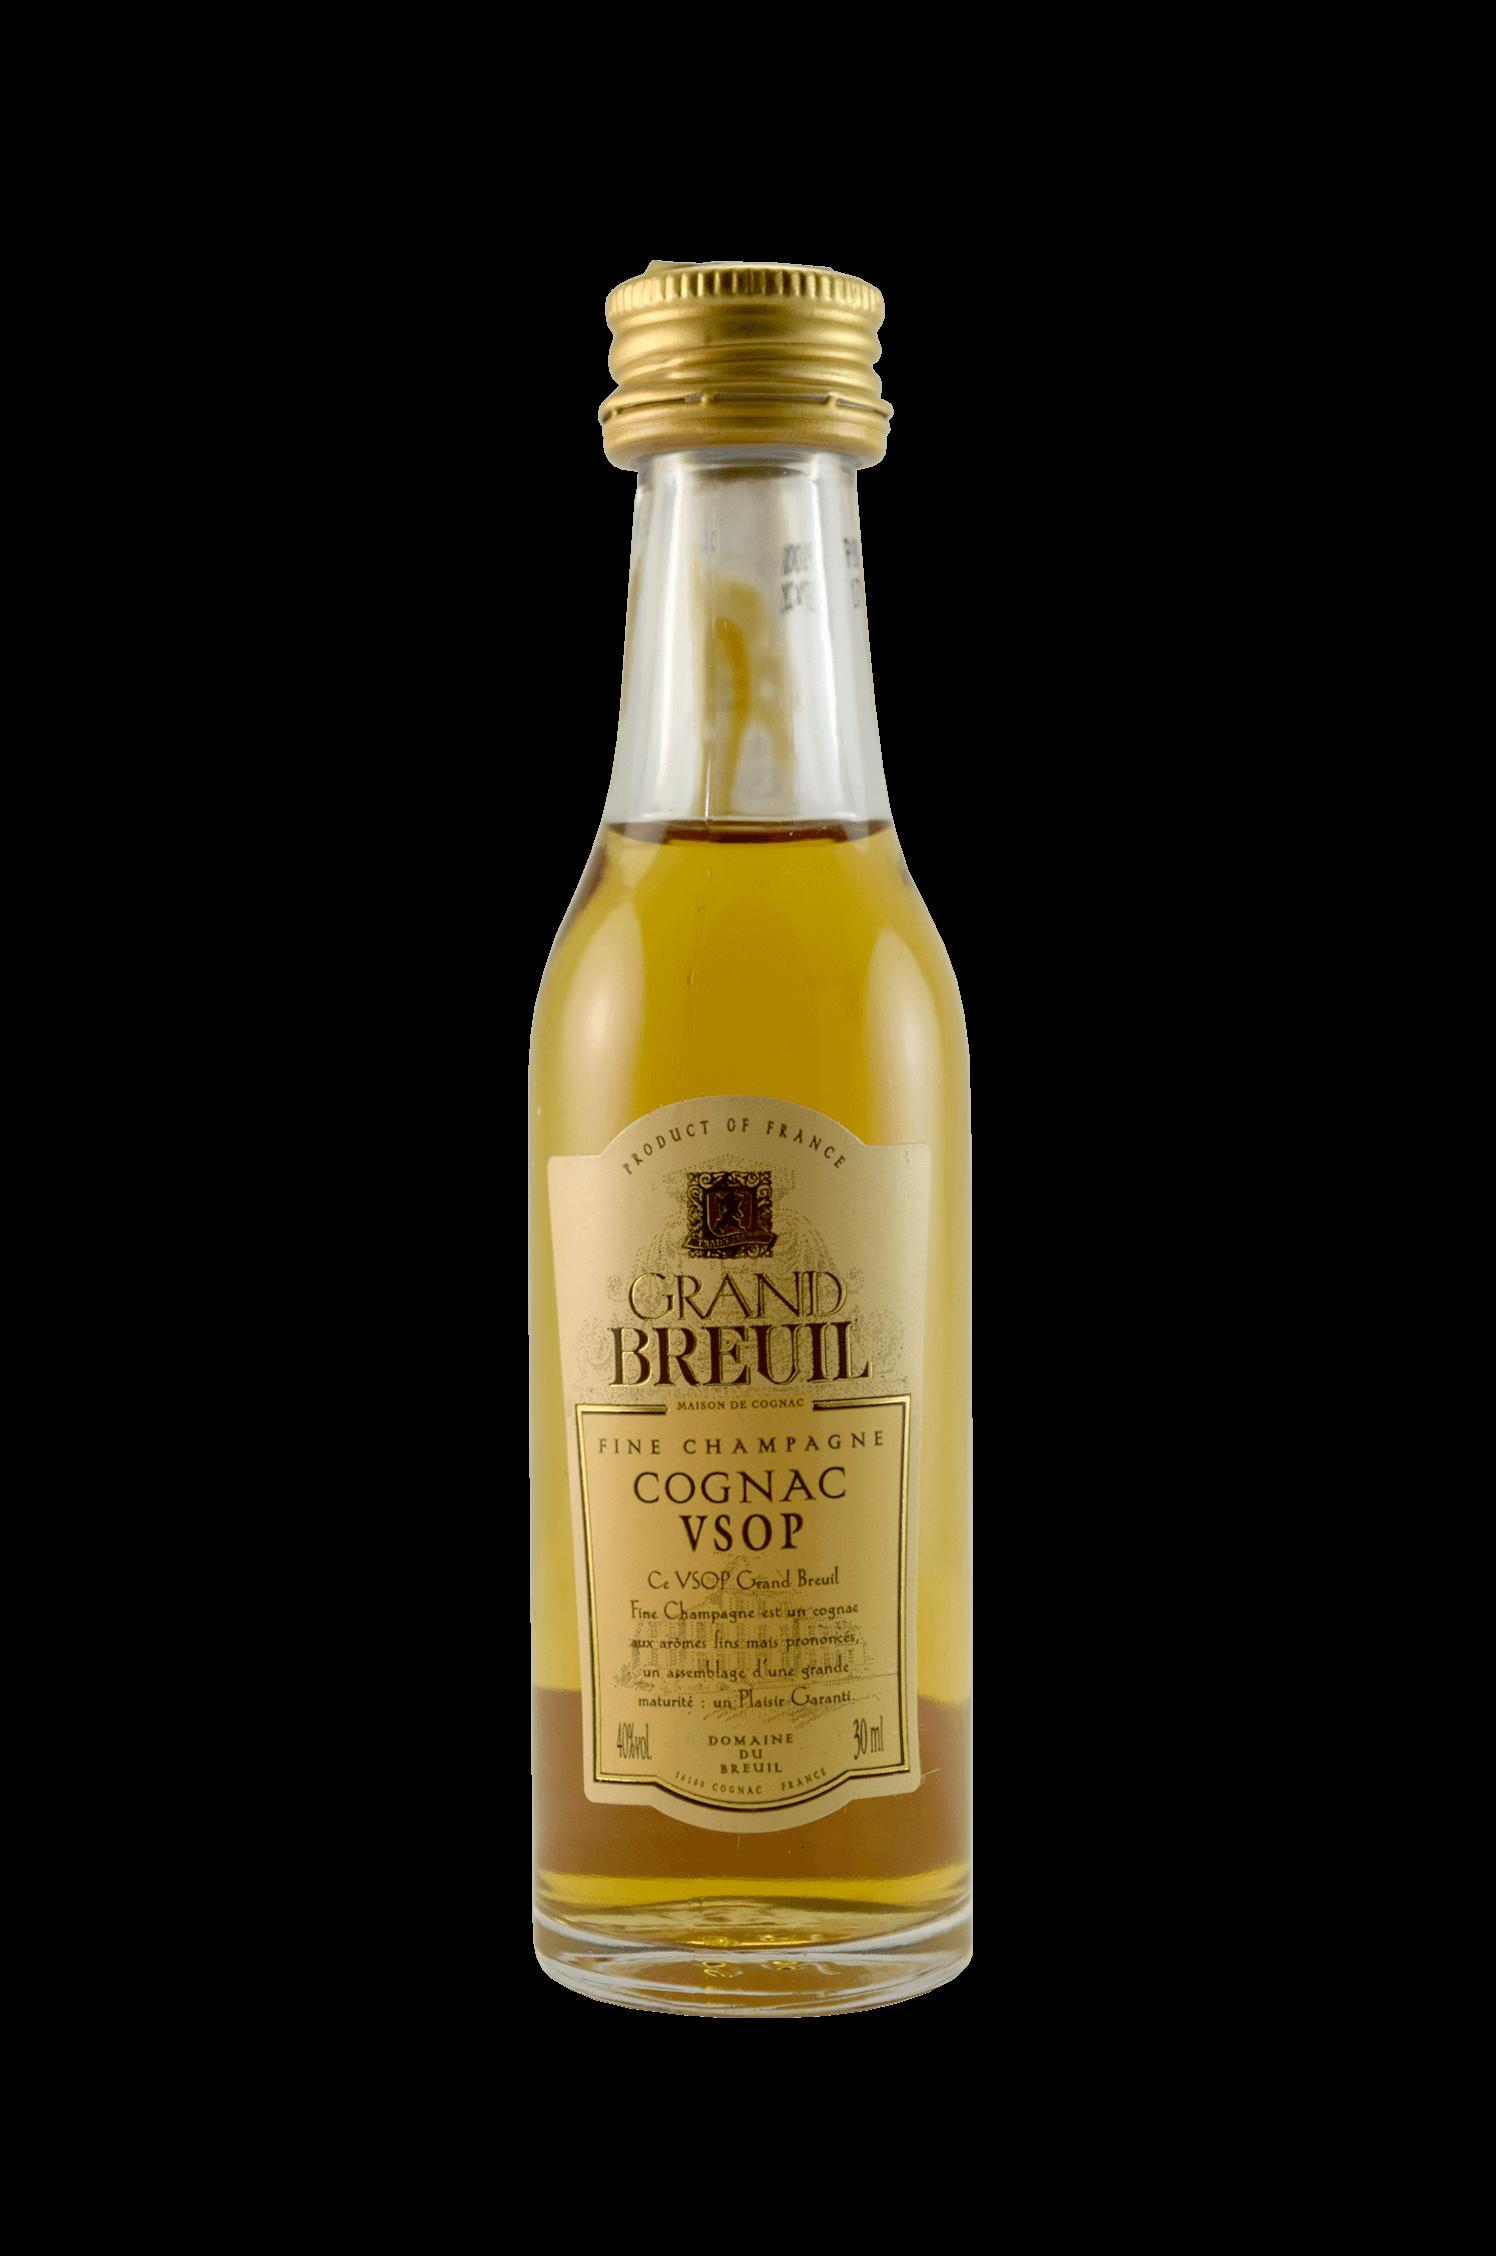 Grand Breuil Cognac VSOP